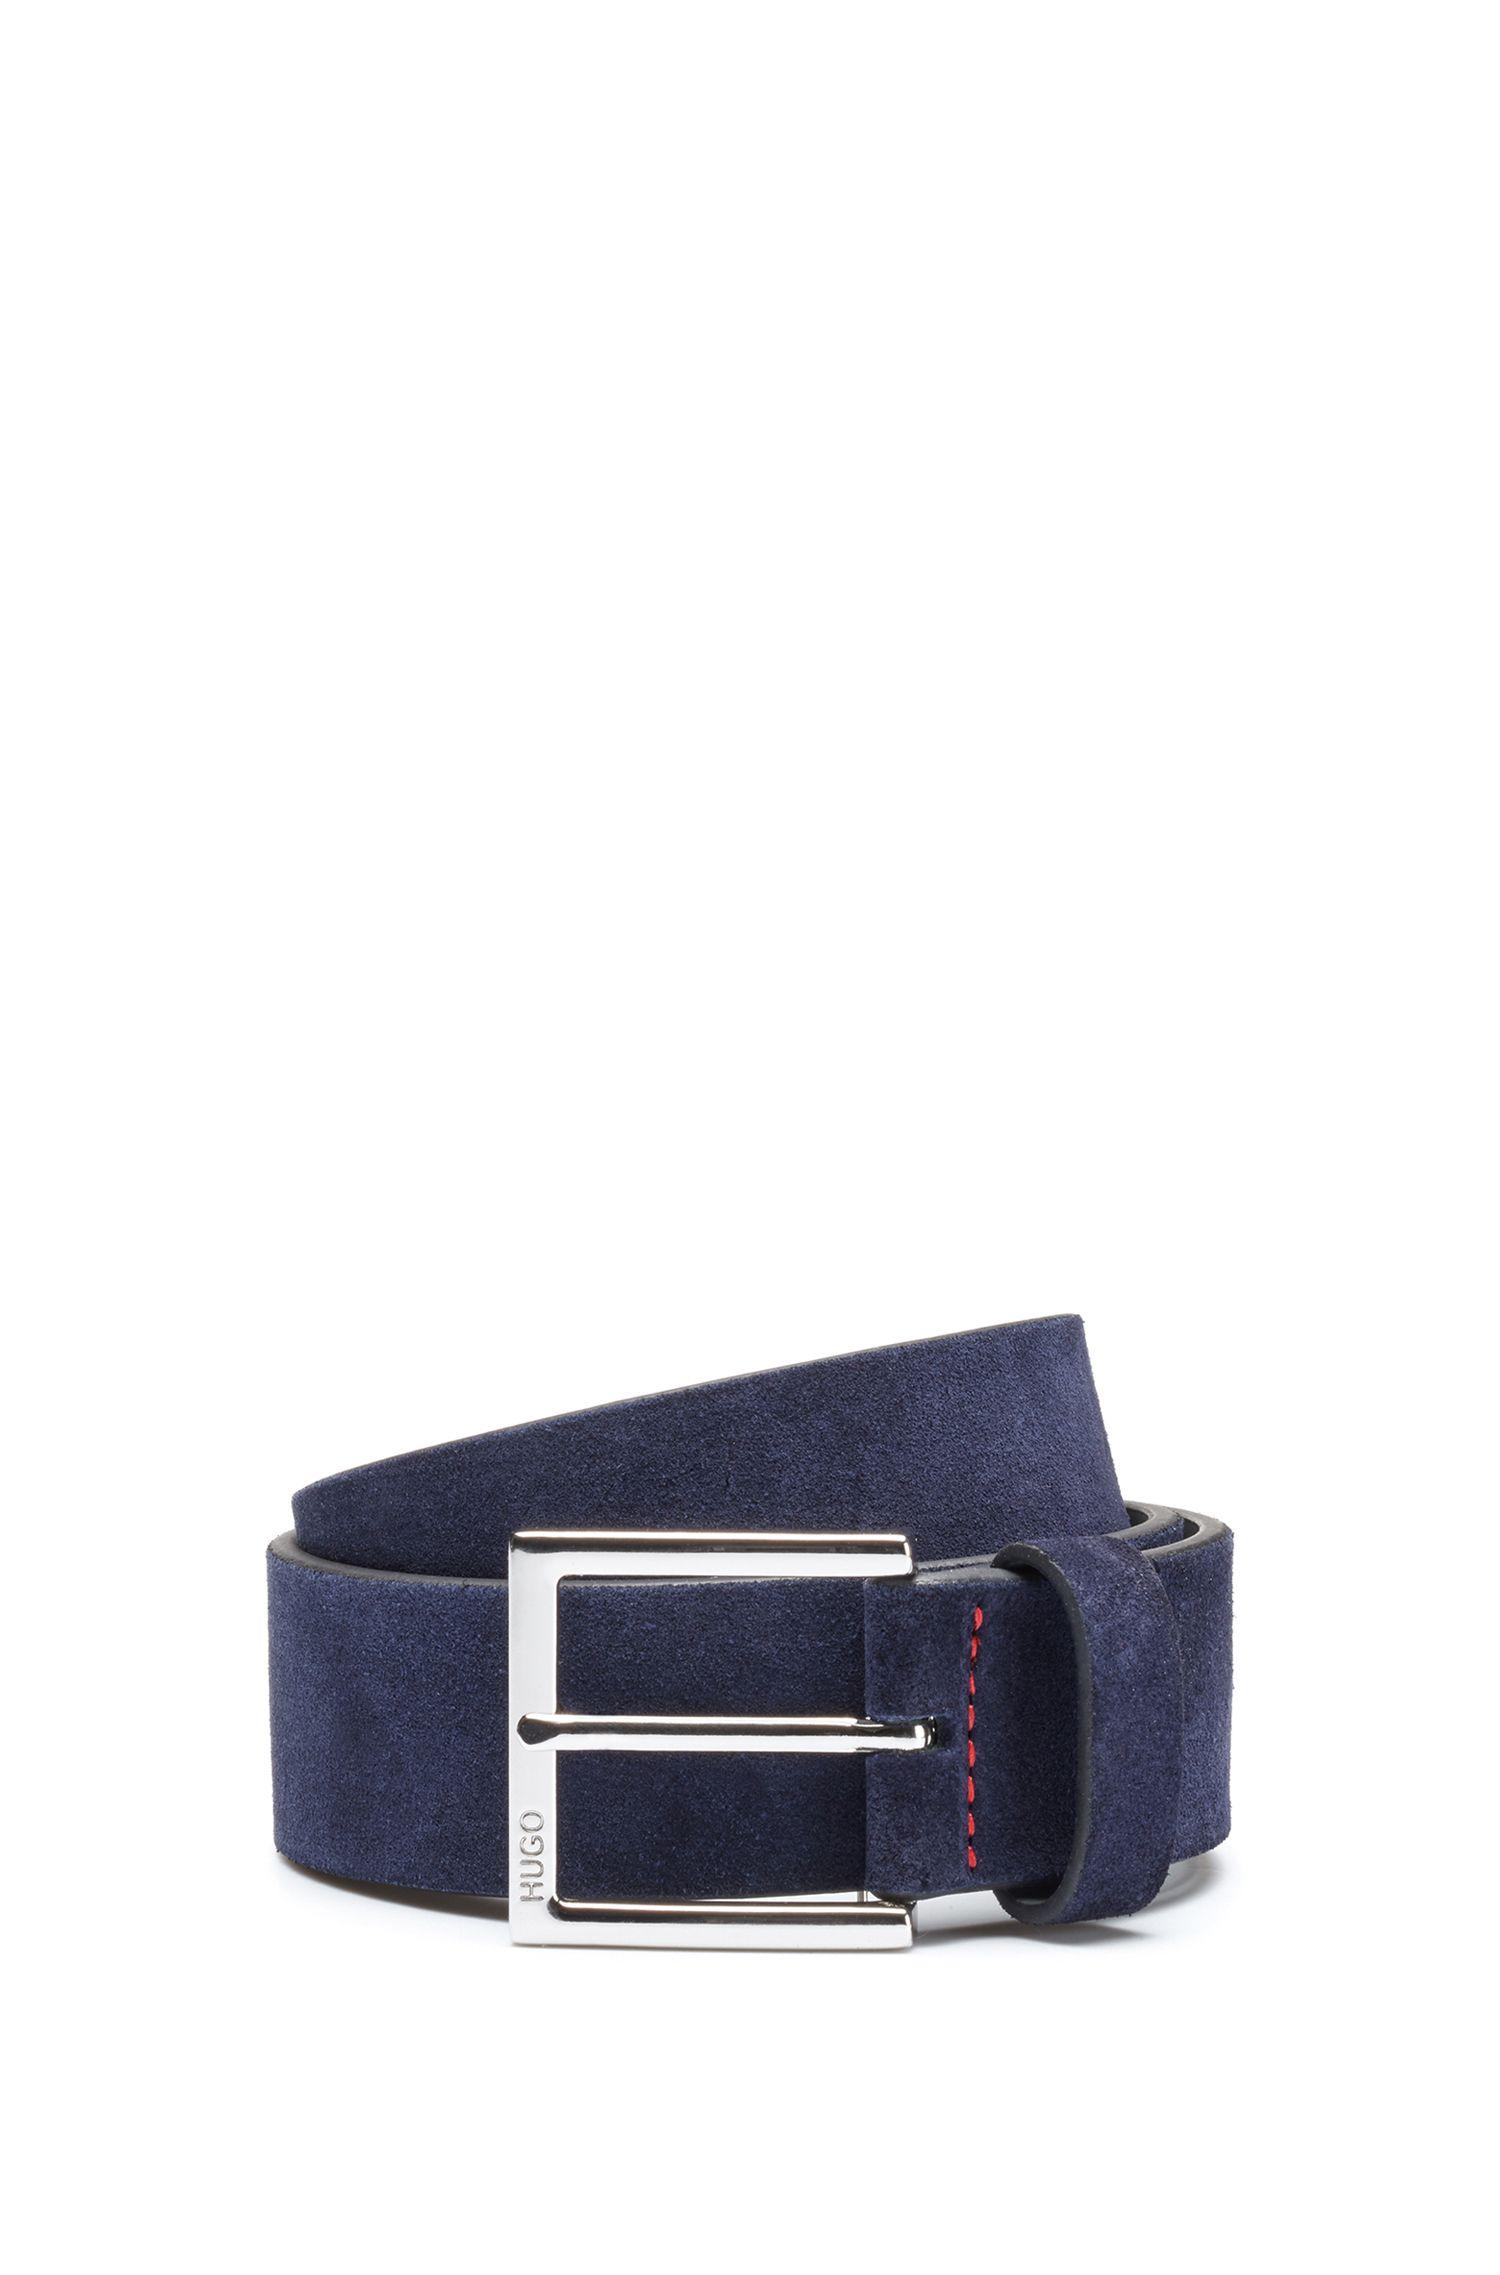 Suede belt with polished silver-effect buckle, Dark Blue